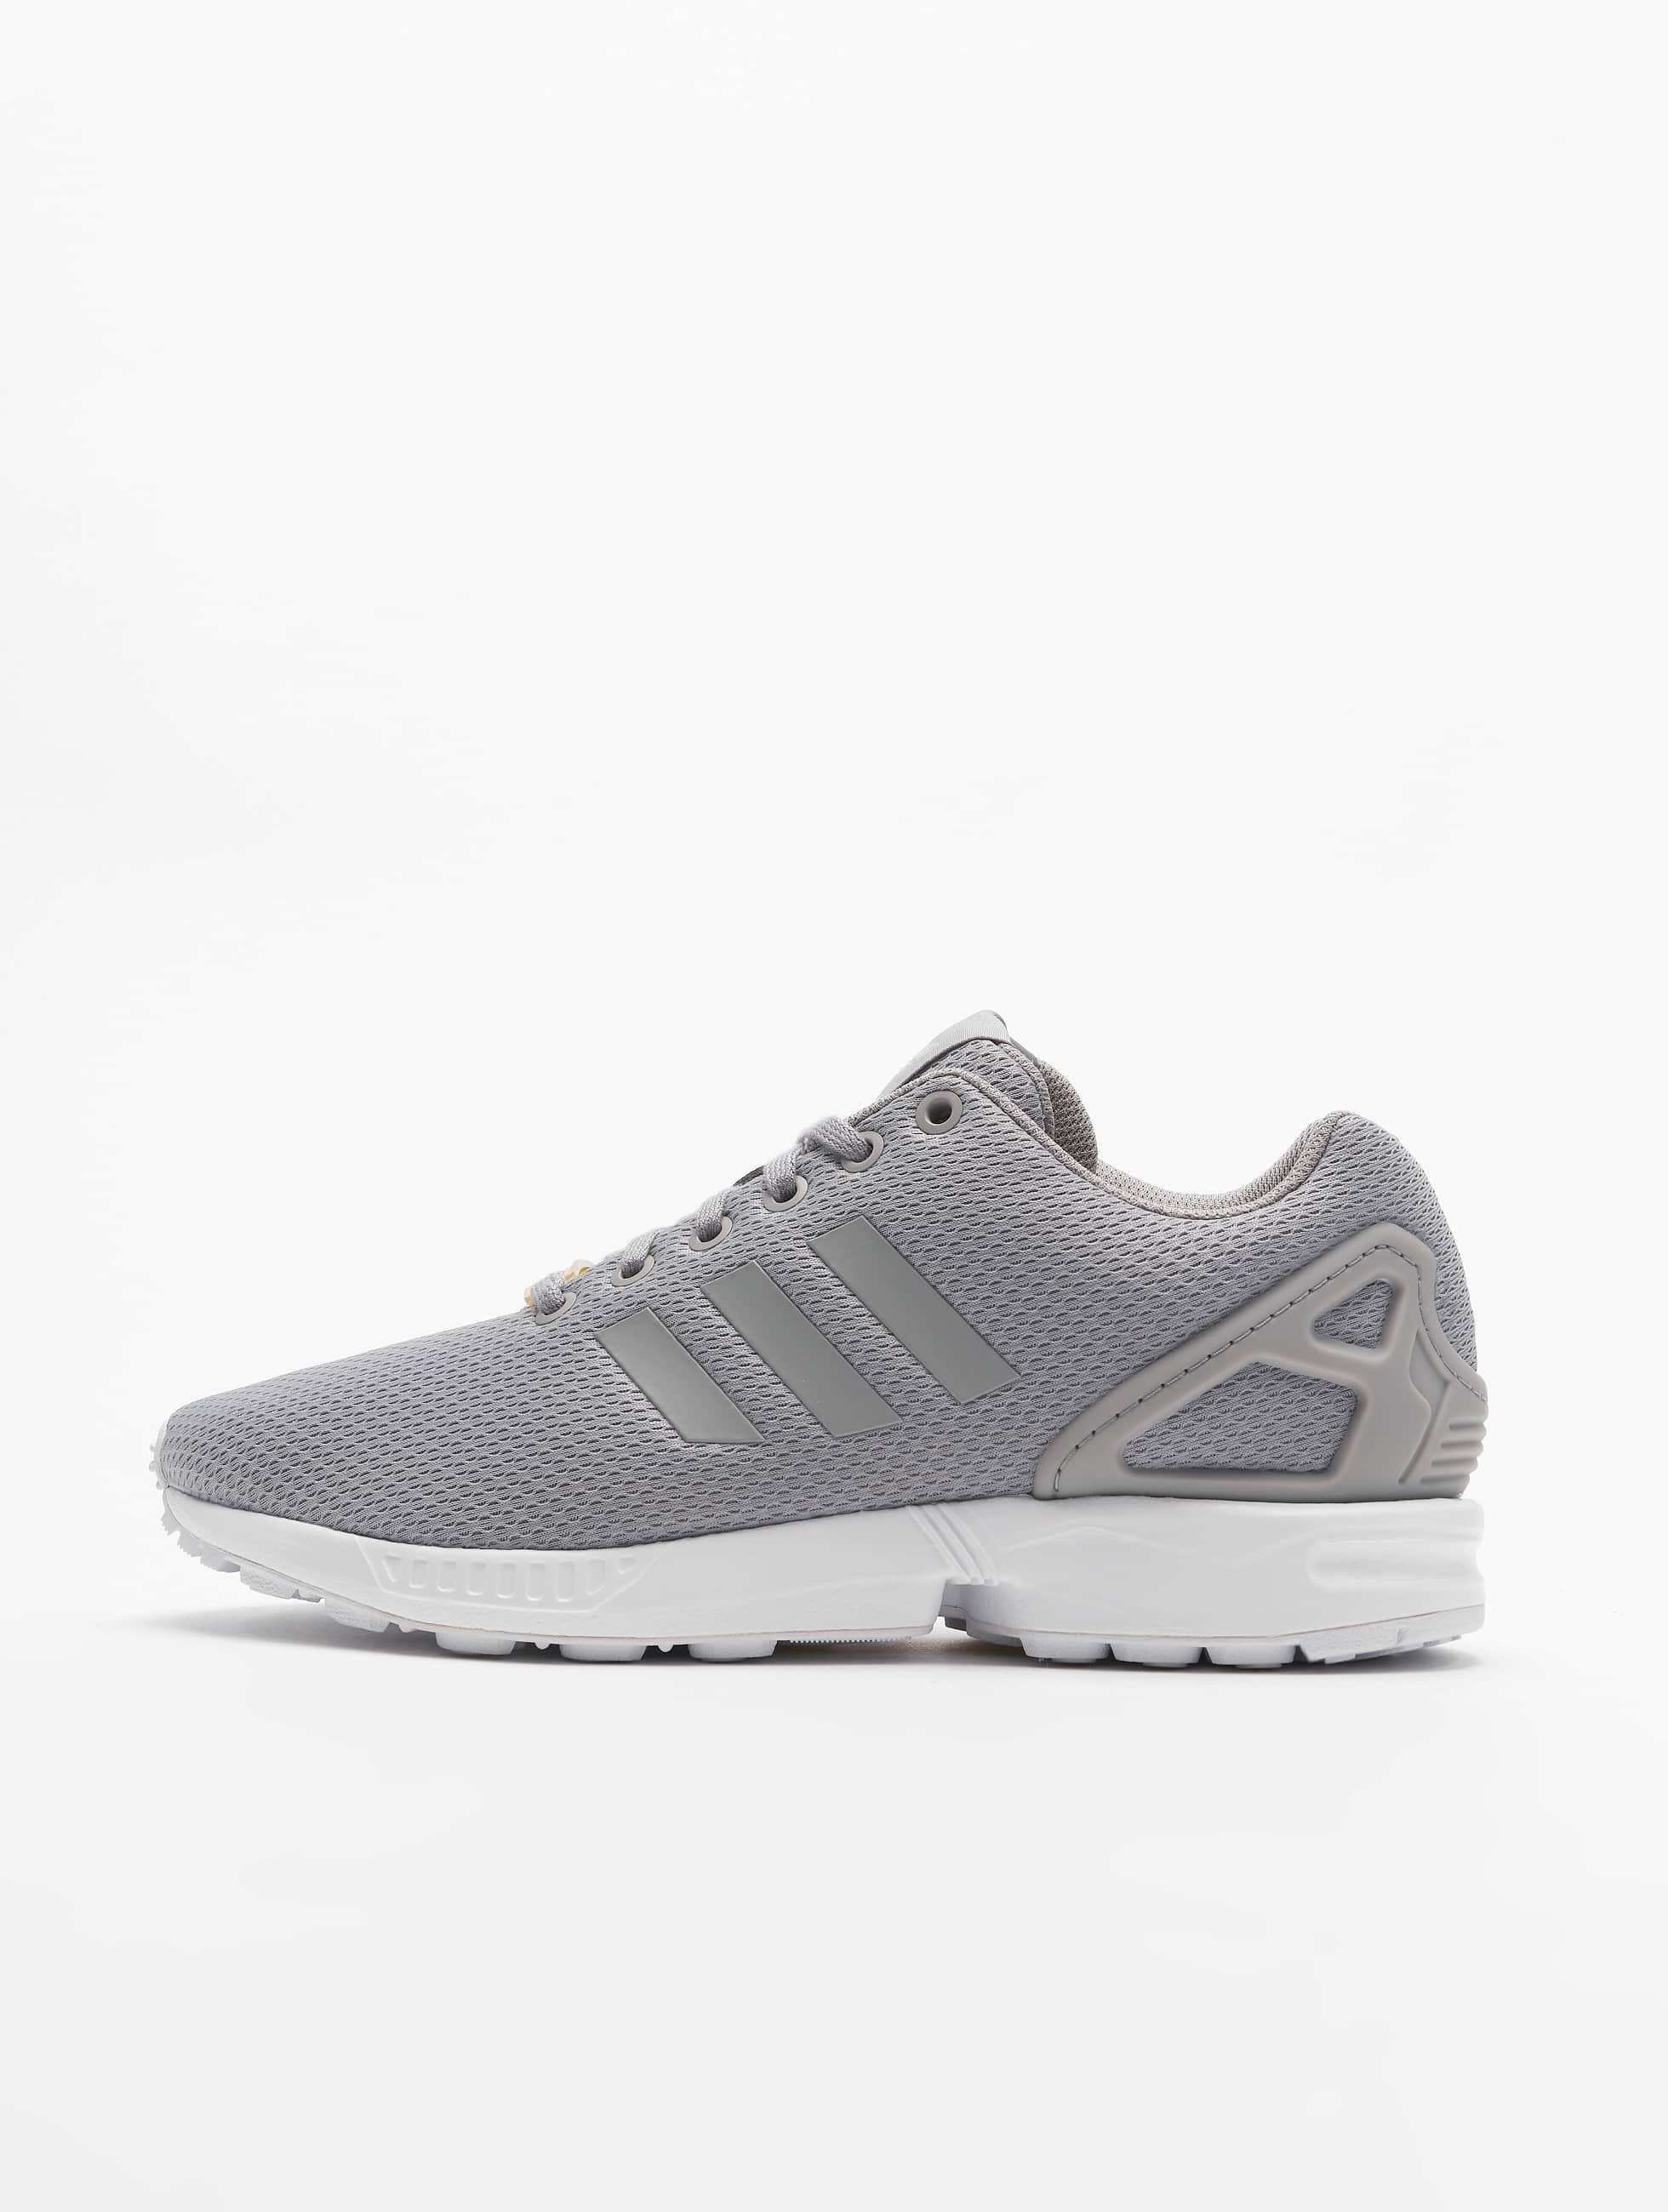 sneakers adidas zx flux